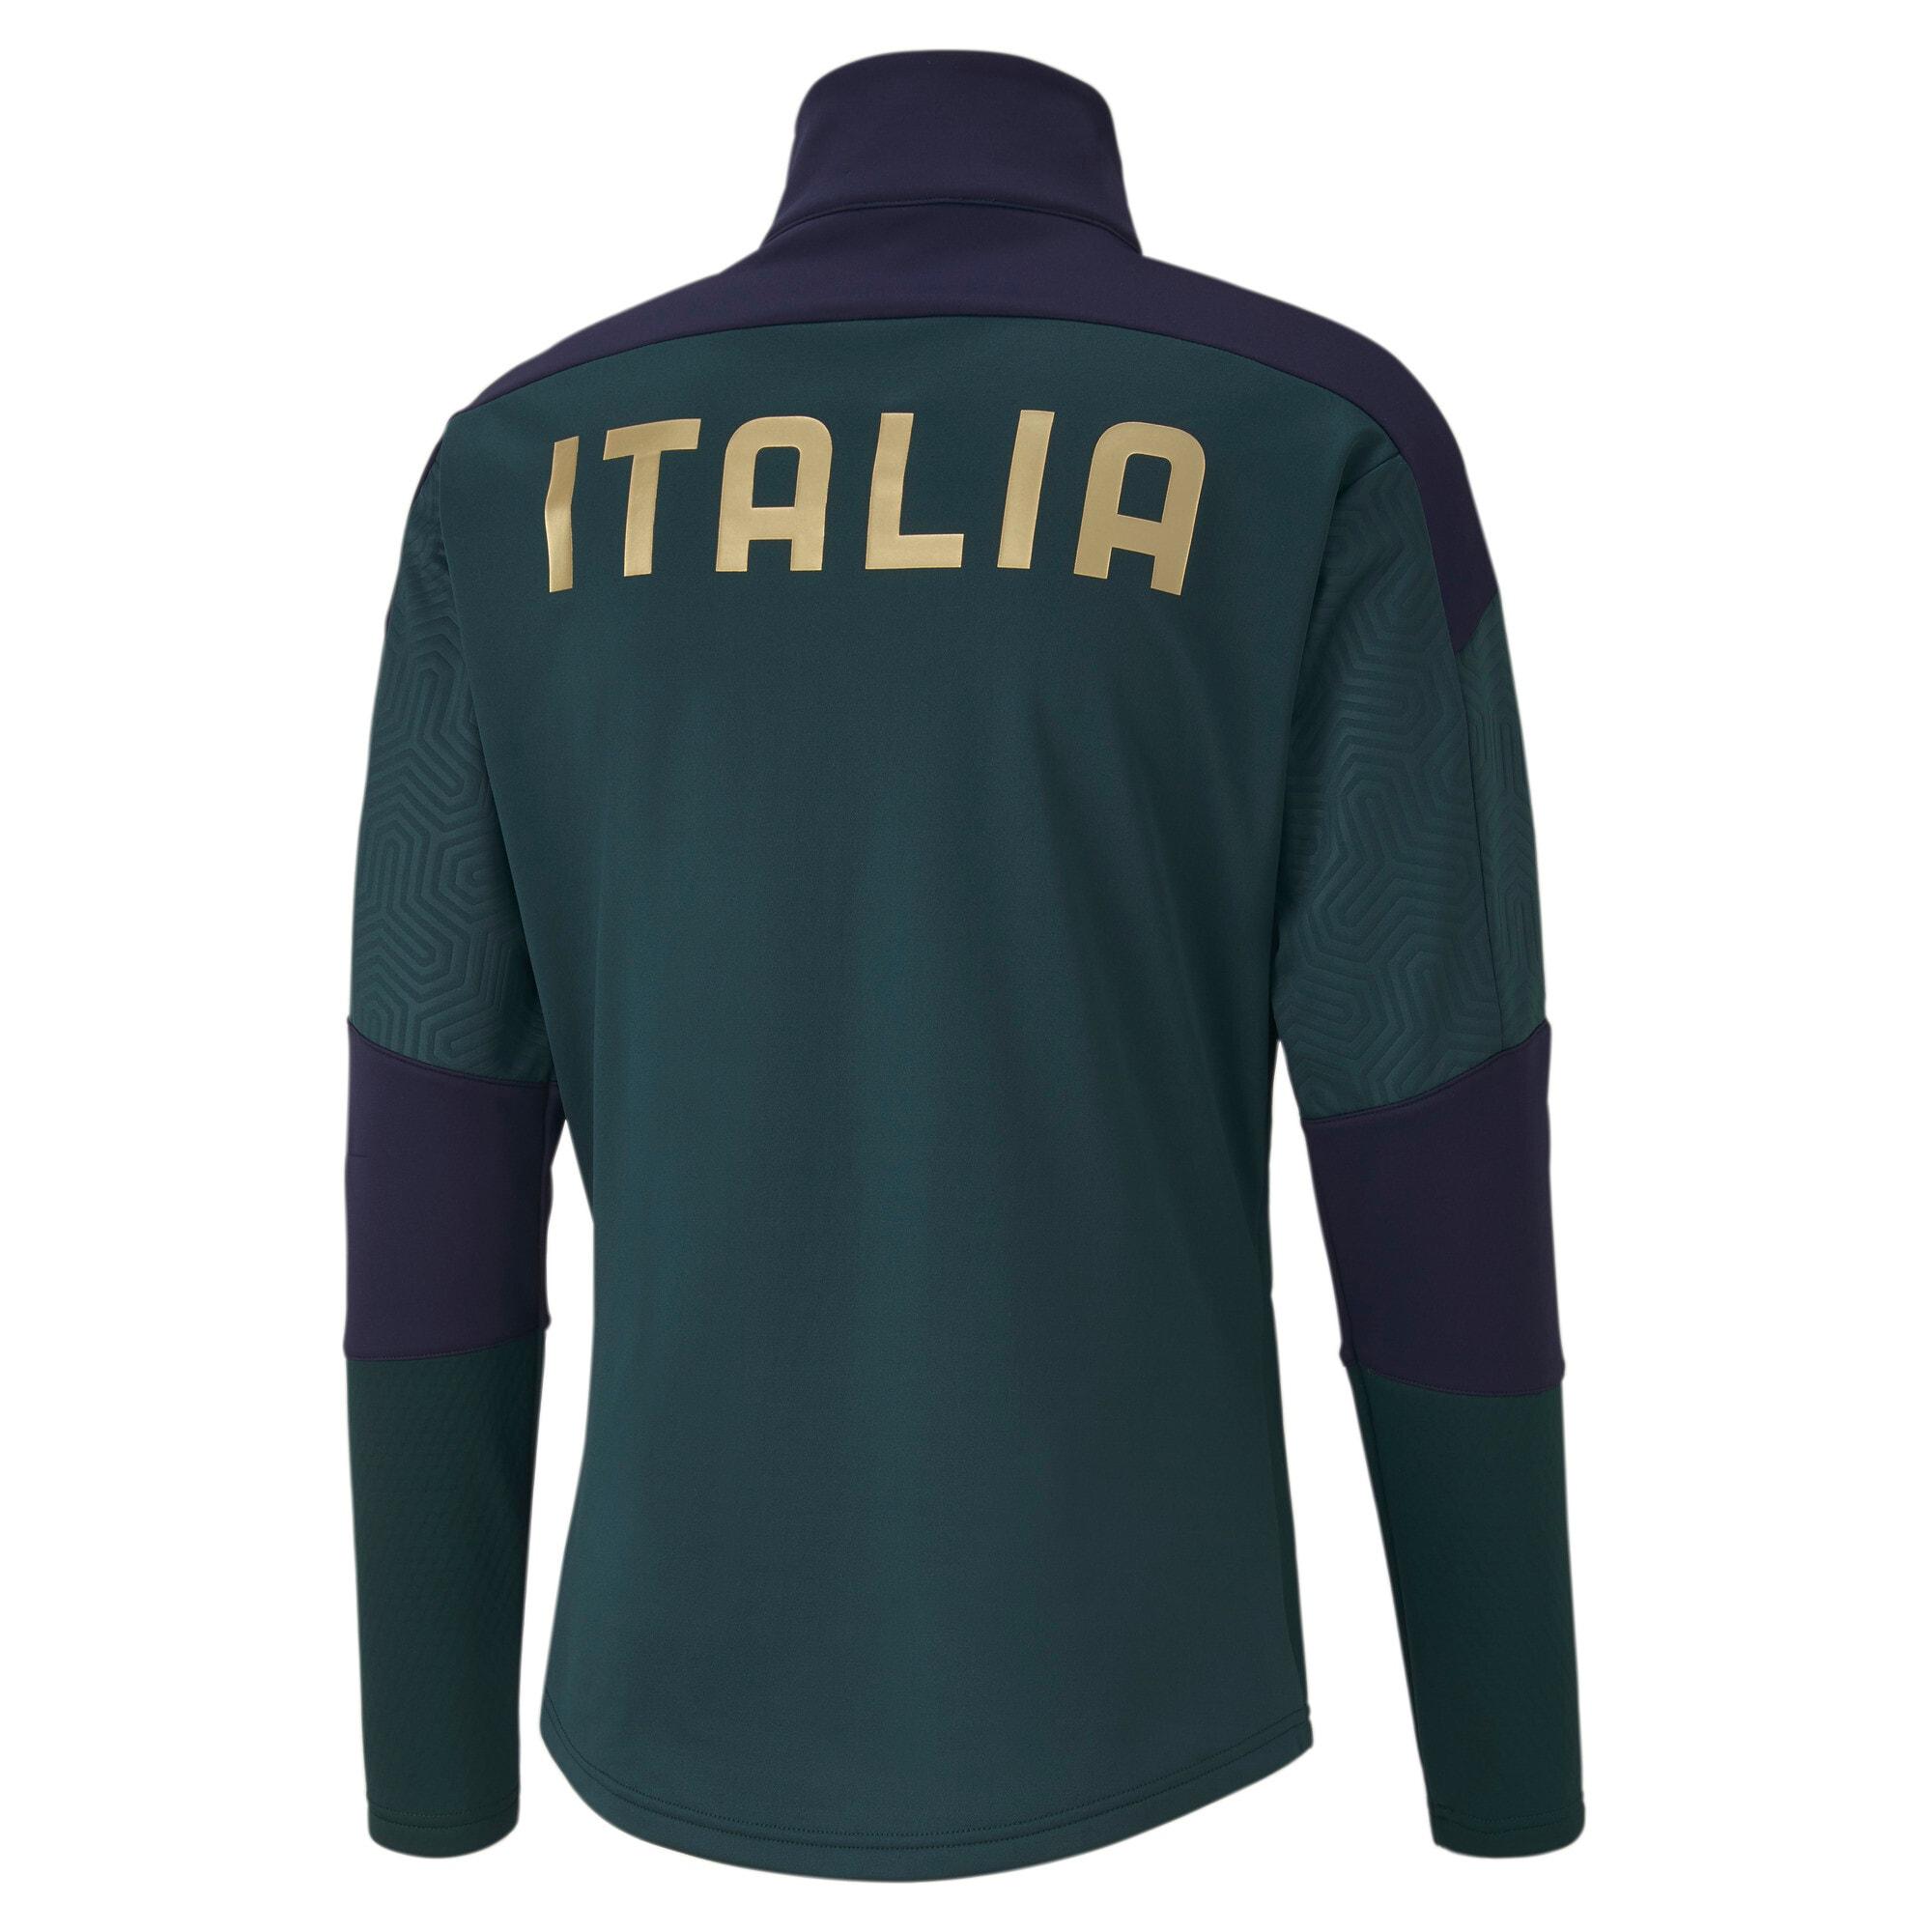 Thumbnail 2 of FIGC Men's Training Fleece, Ponderosa Pine-Peacoat, medium